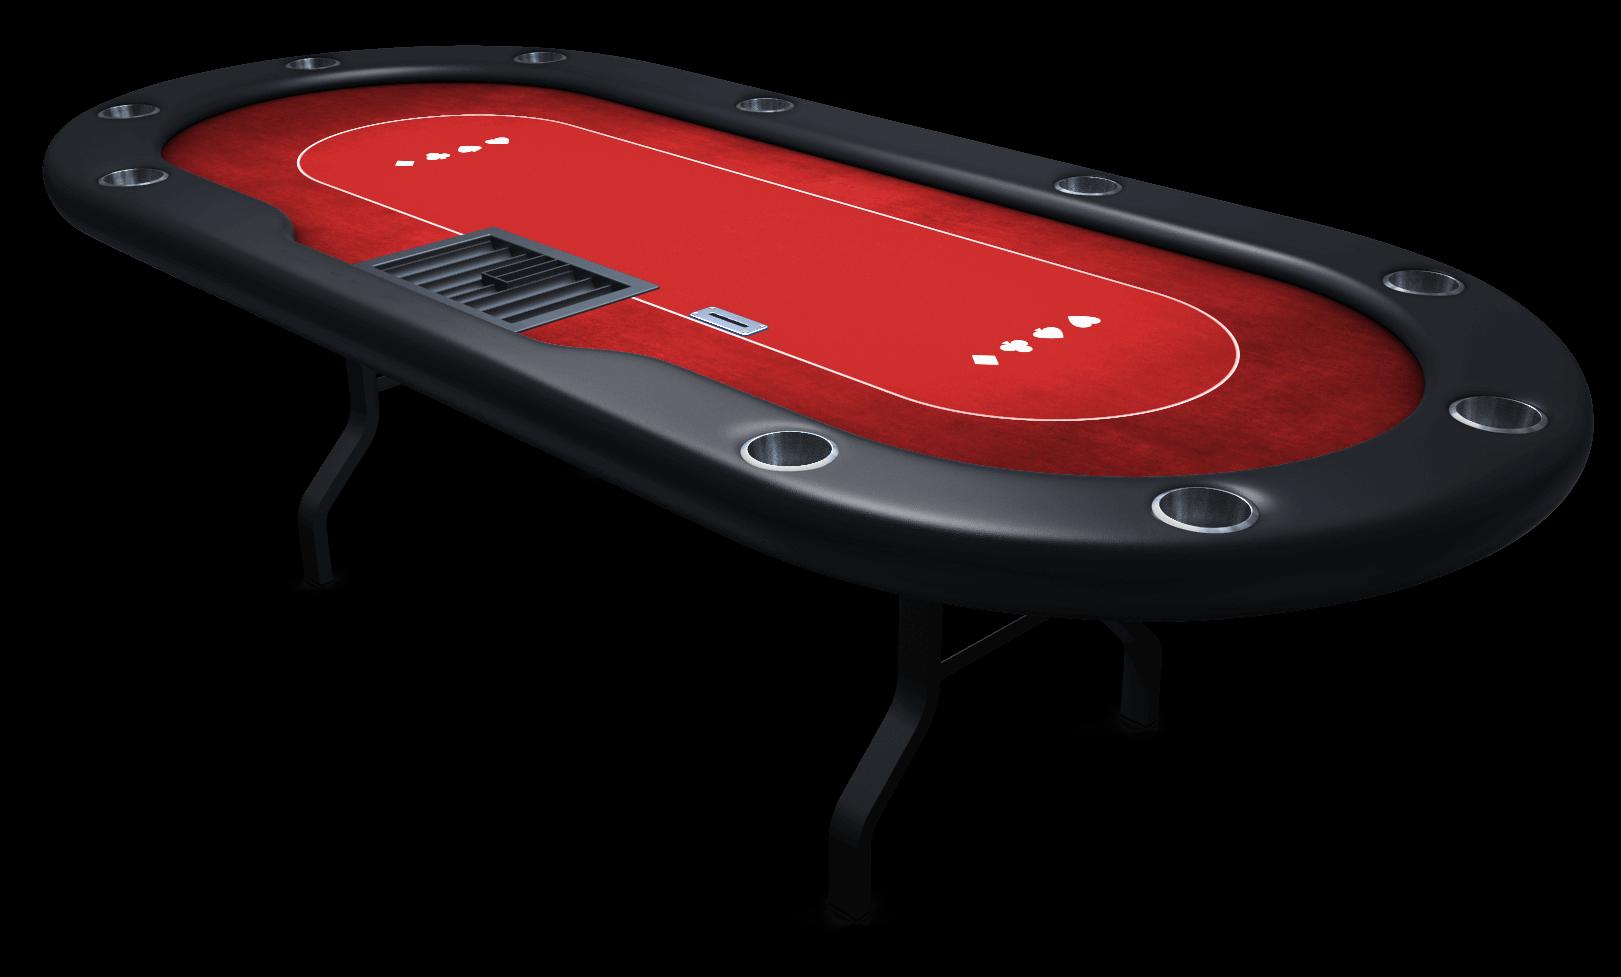 Enjoyable Home Gorilla Gaming Fully Customizable Poker Tables Interior Design Ideas Tzicisoteloinfo